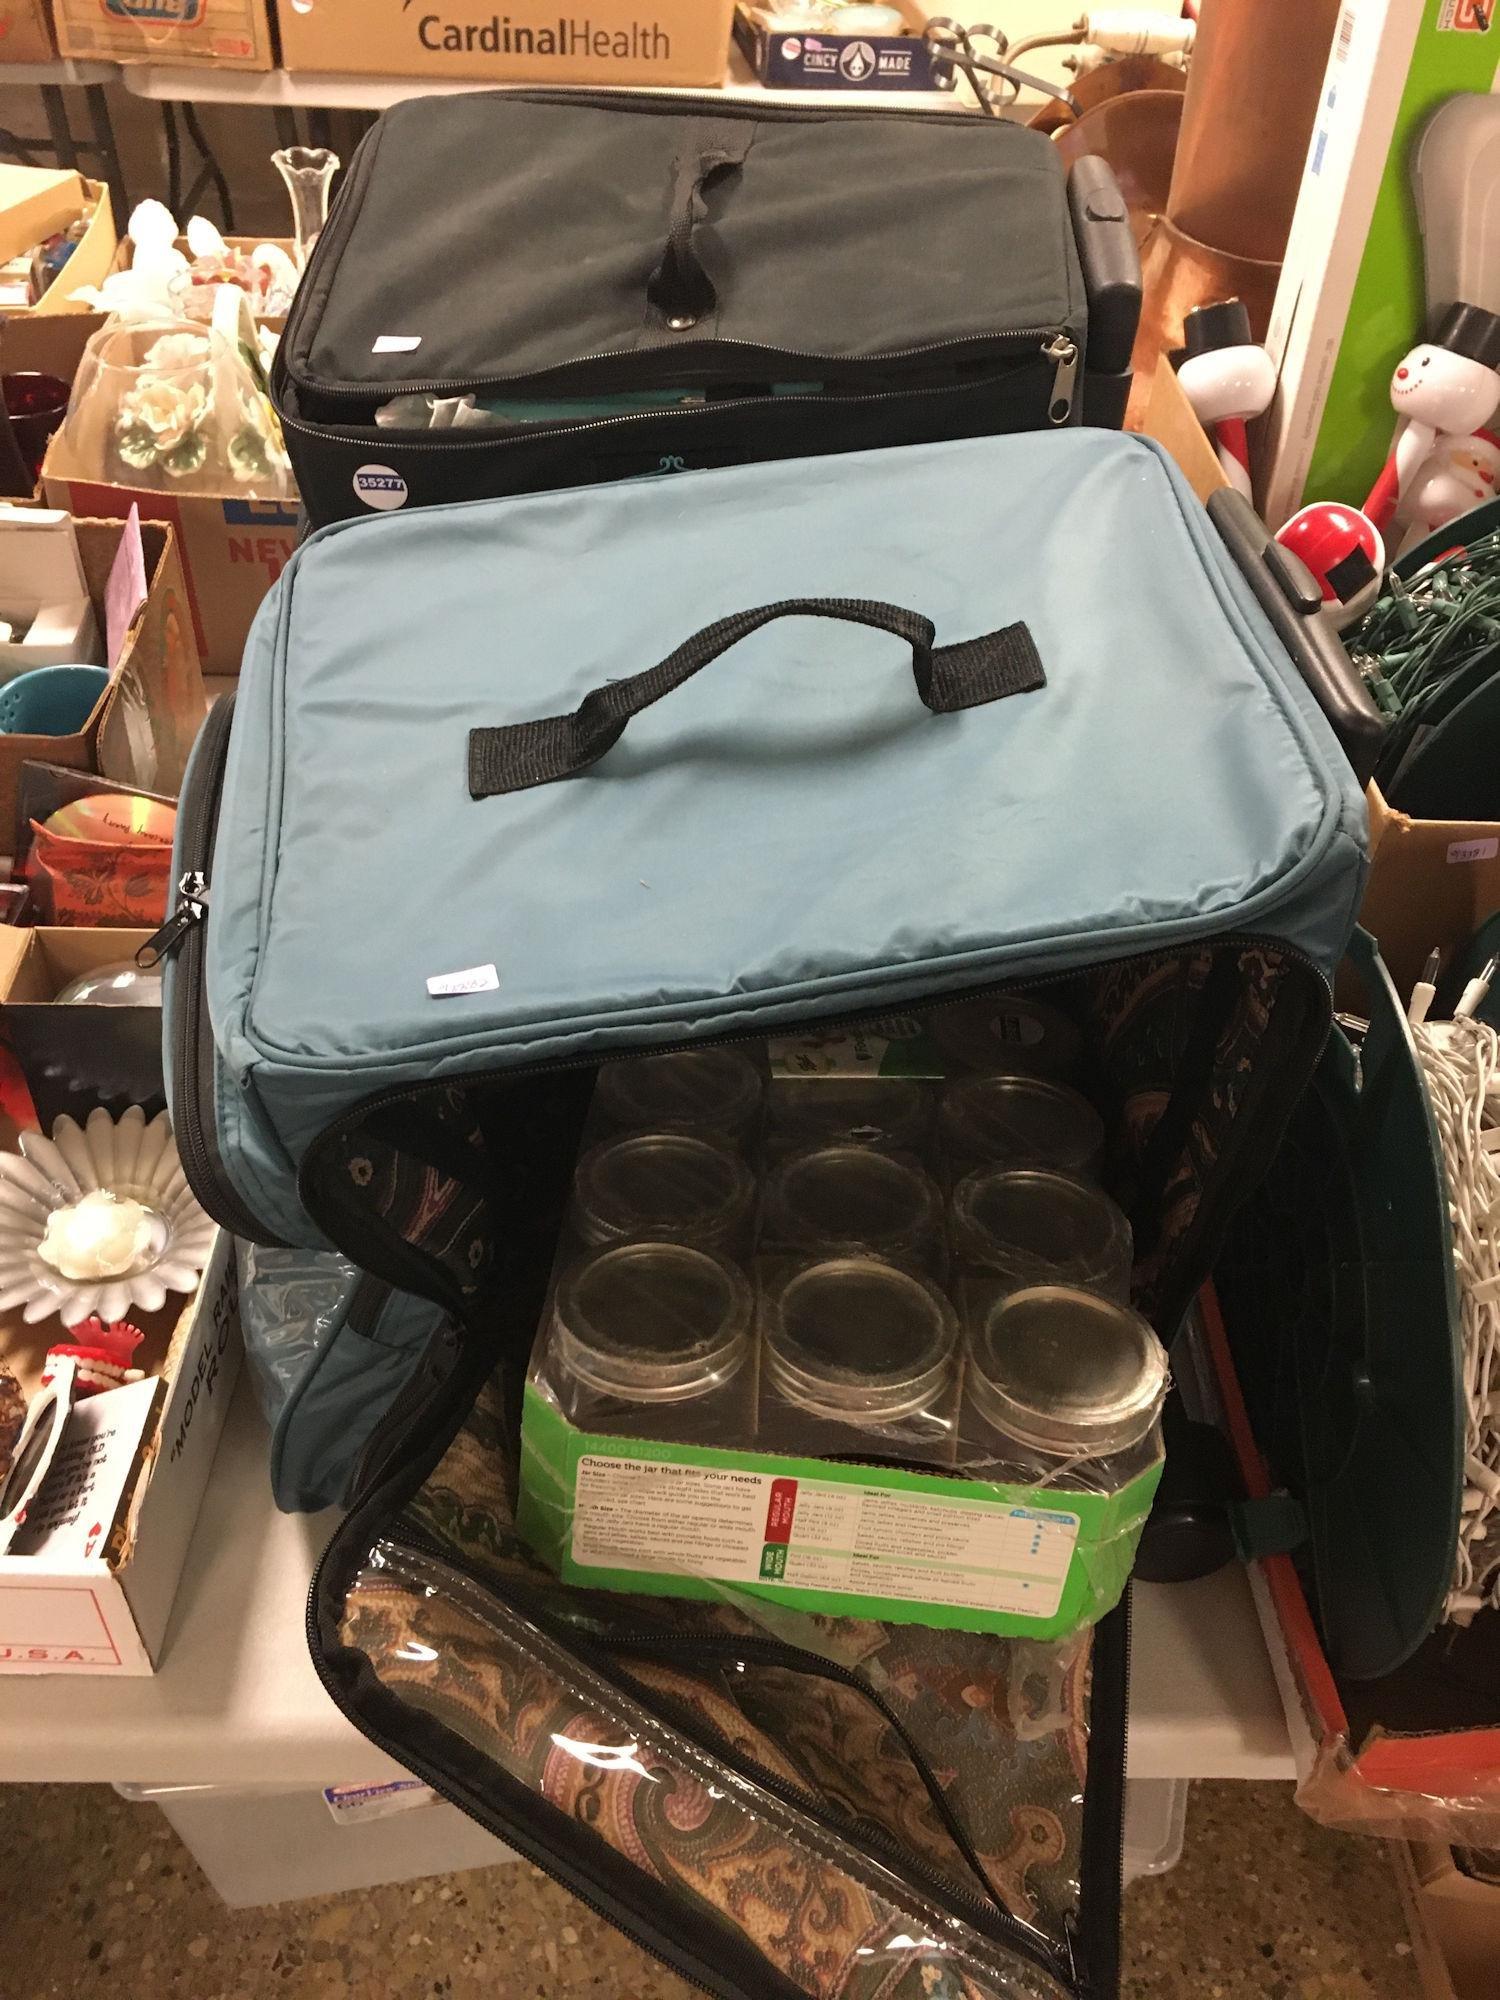 2 TRAVEL CASES AND MASON JARS